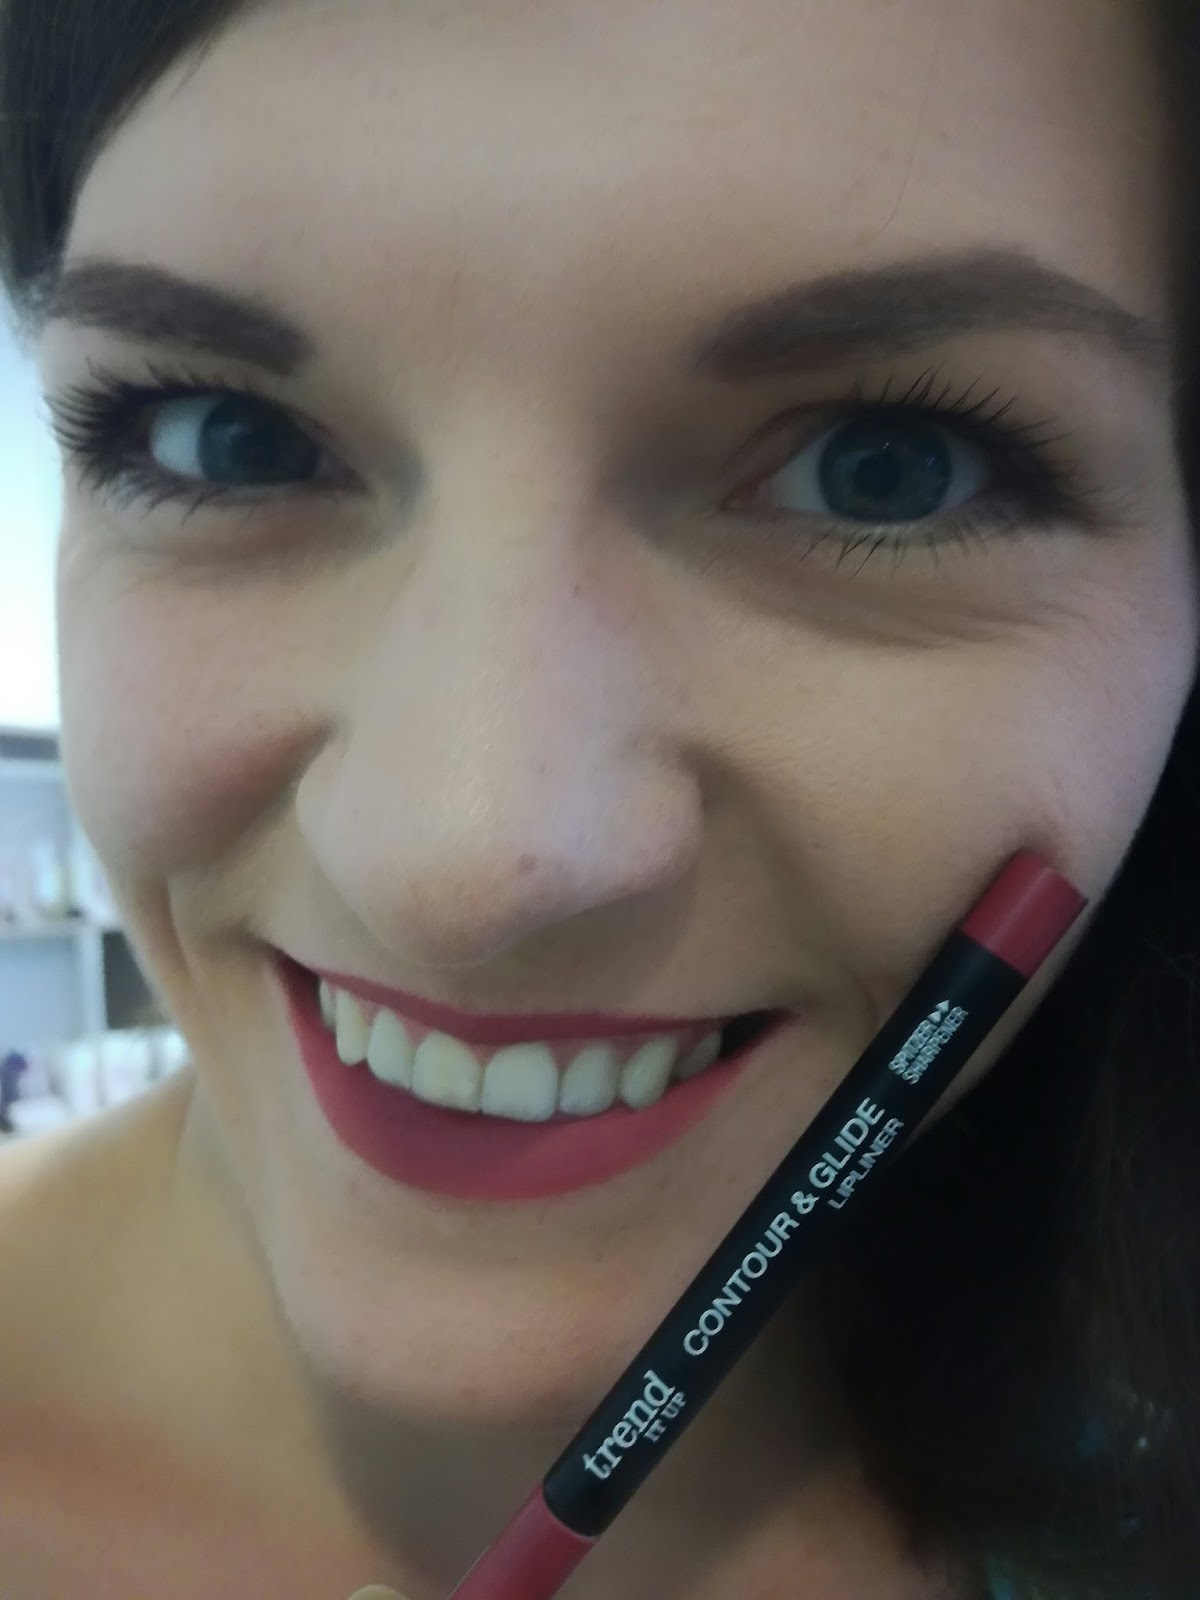 trend-it-up-dm-make-up-swatch-contour-glide-lipliner-430